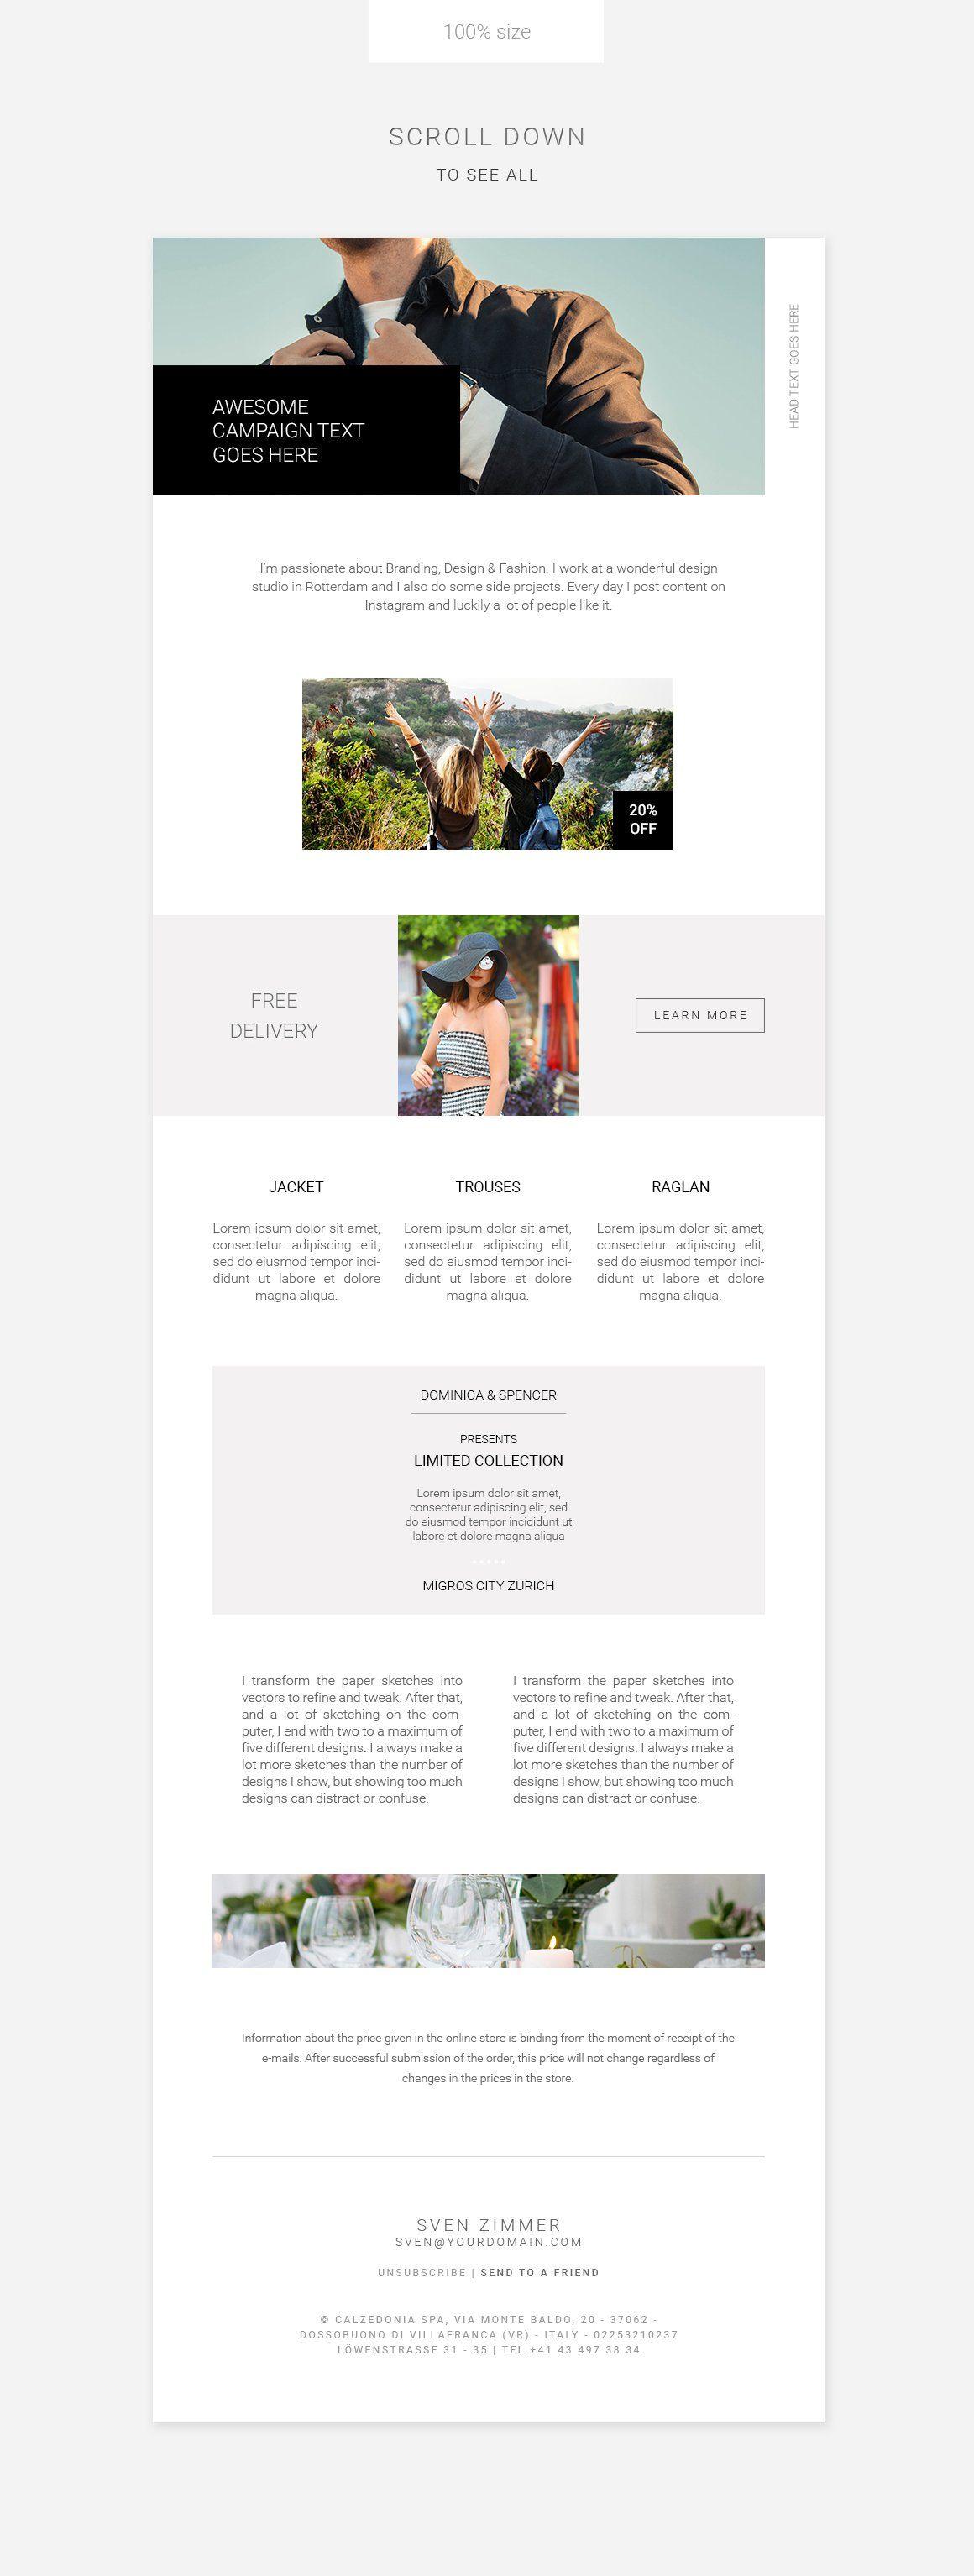 Clean E Newsletter Bundle Newsletter Templates Adobe Photoshop Elements Photoshop Elements